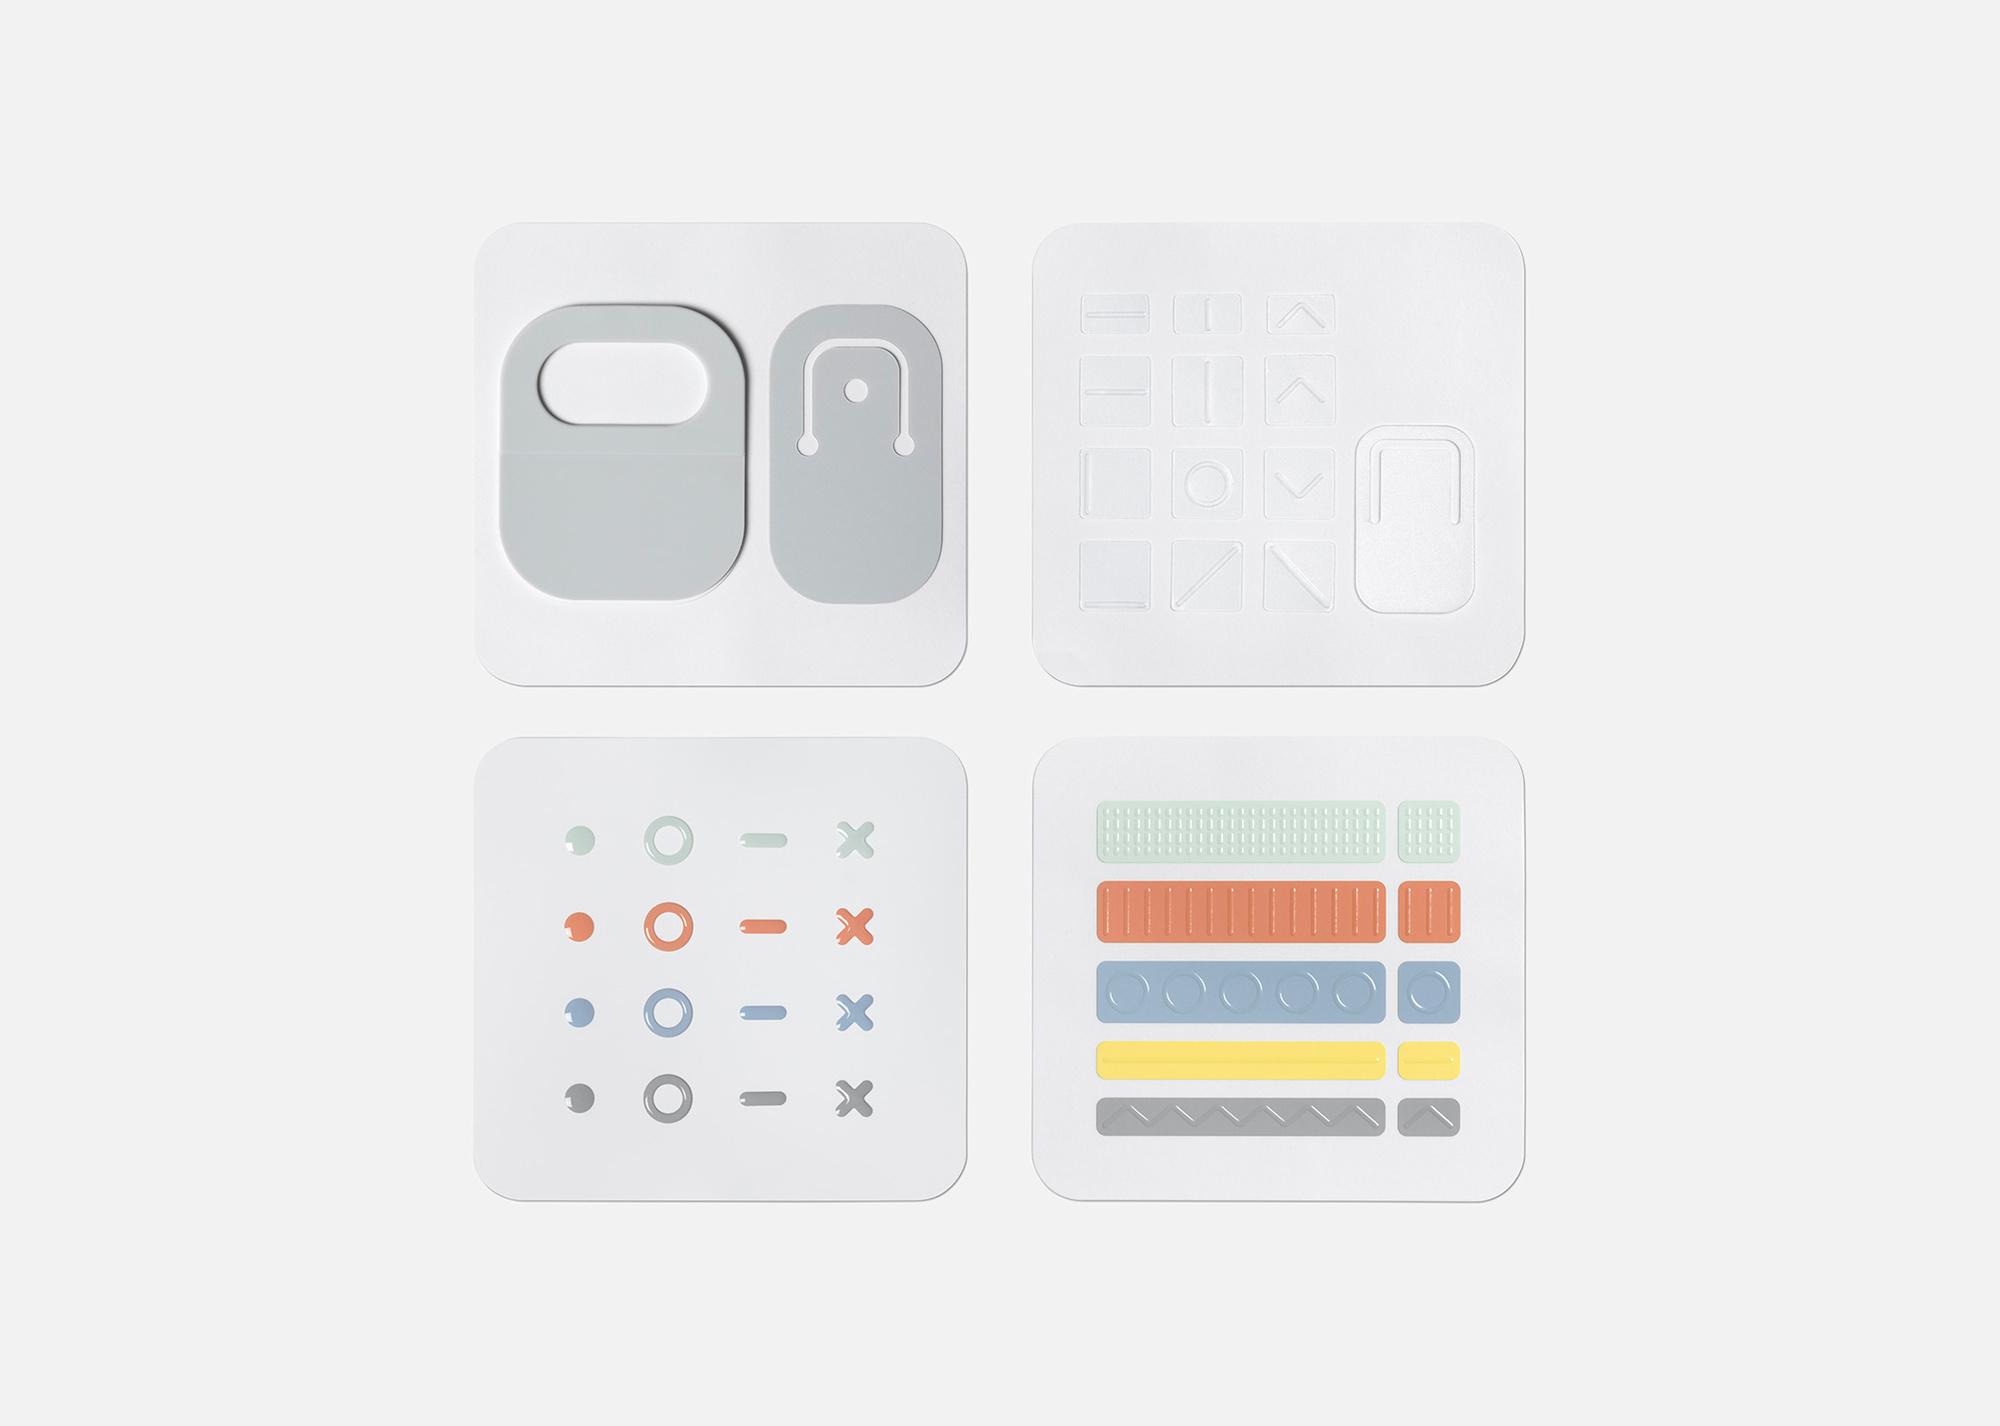 Surface Adaptive Kit, Microsoft